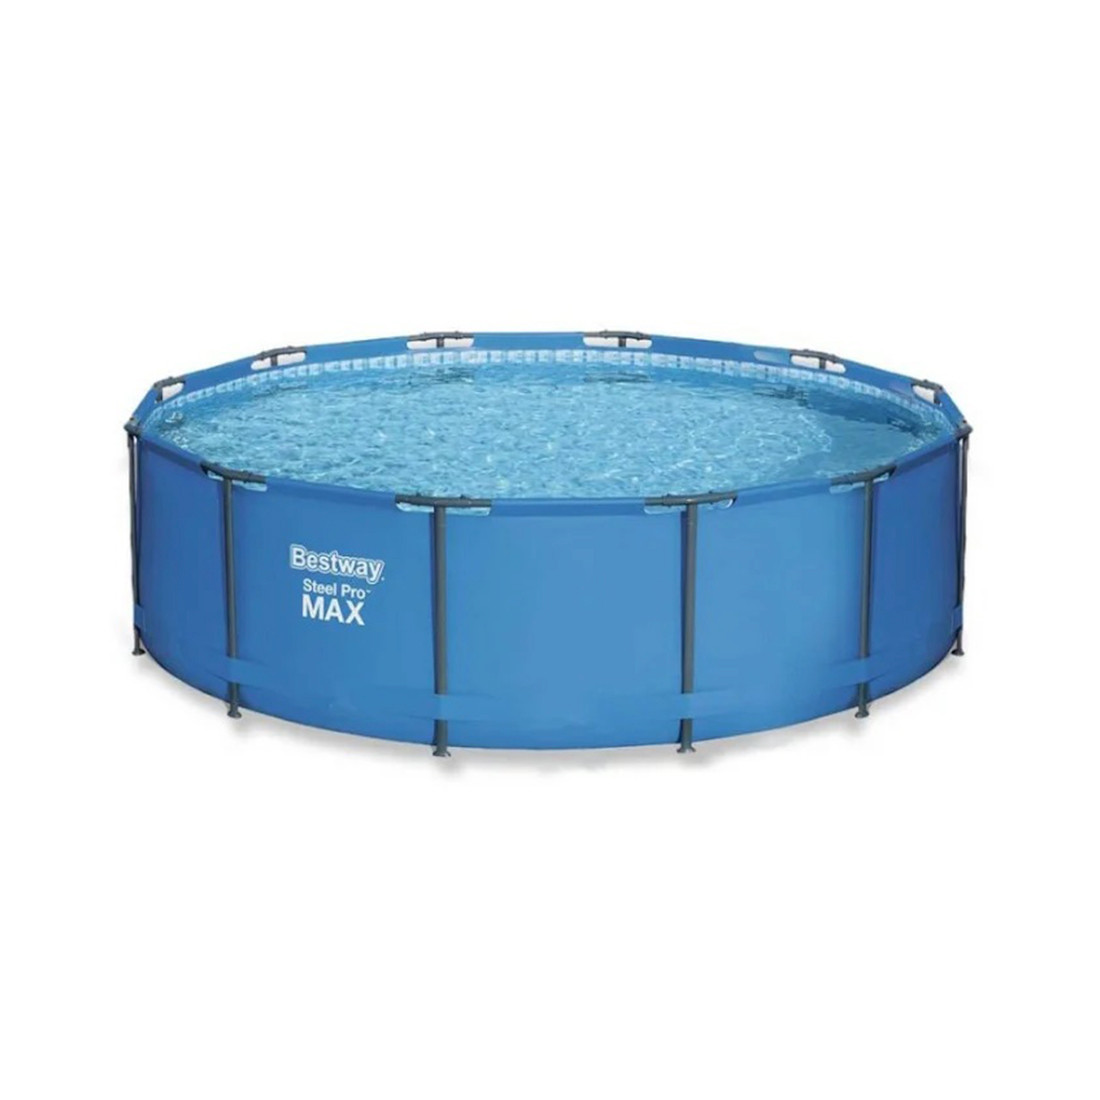 Каркасный бассейн Steel Pro MAX 366 х 133 см, BESTWAY, 15428